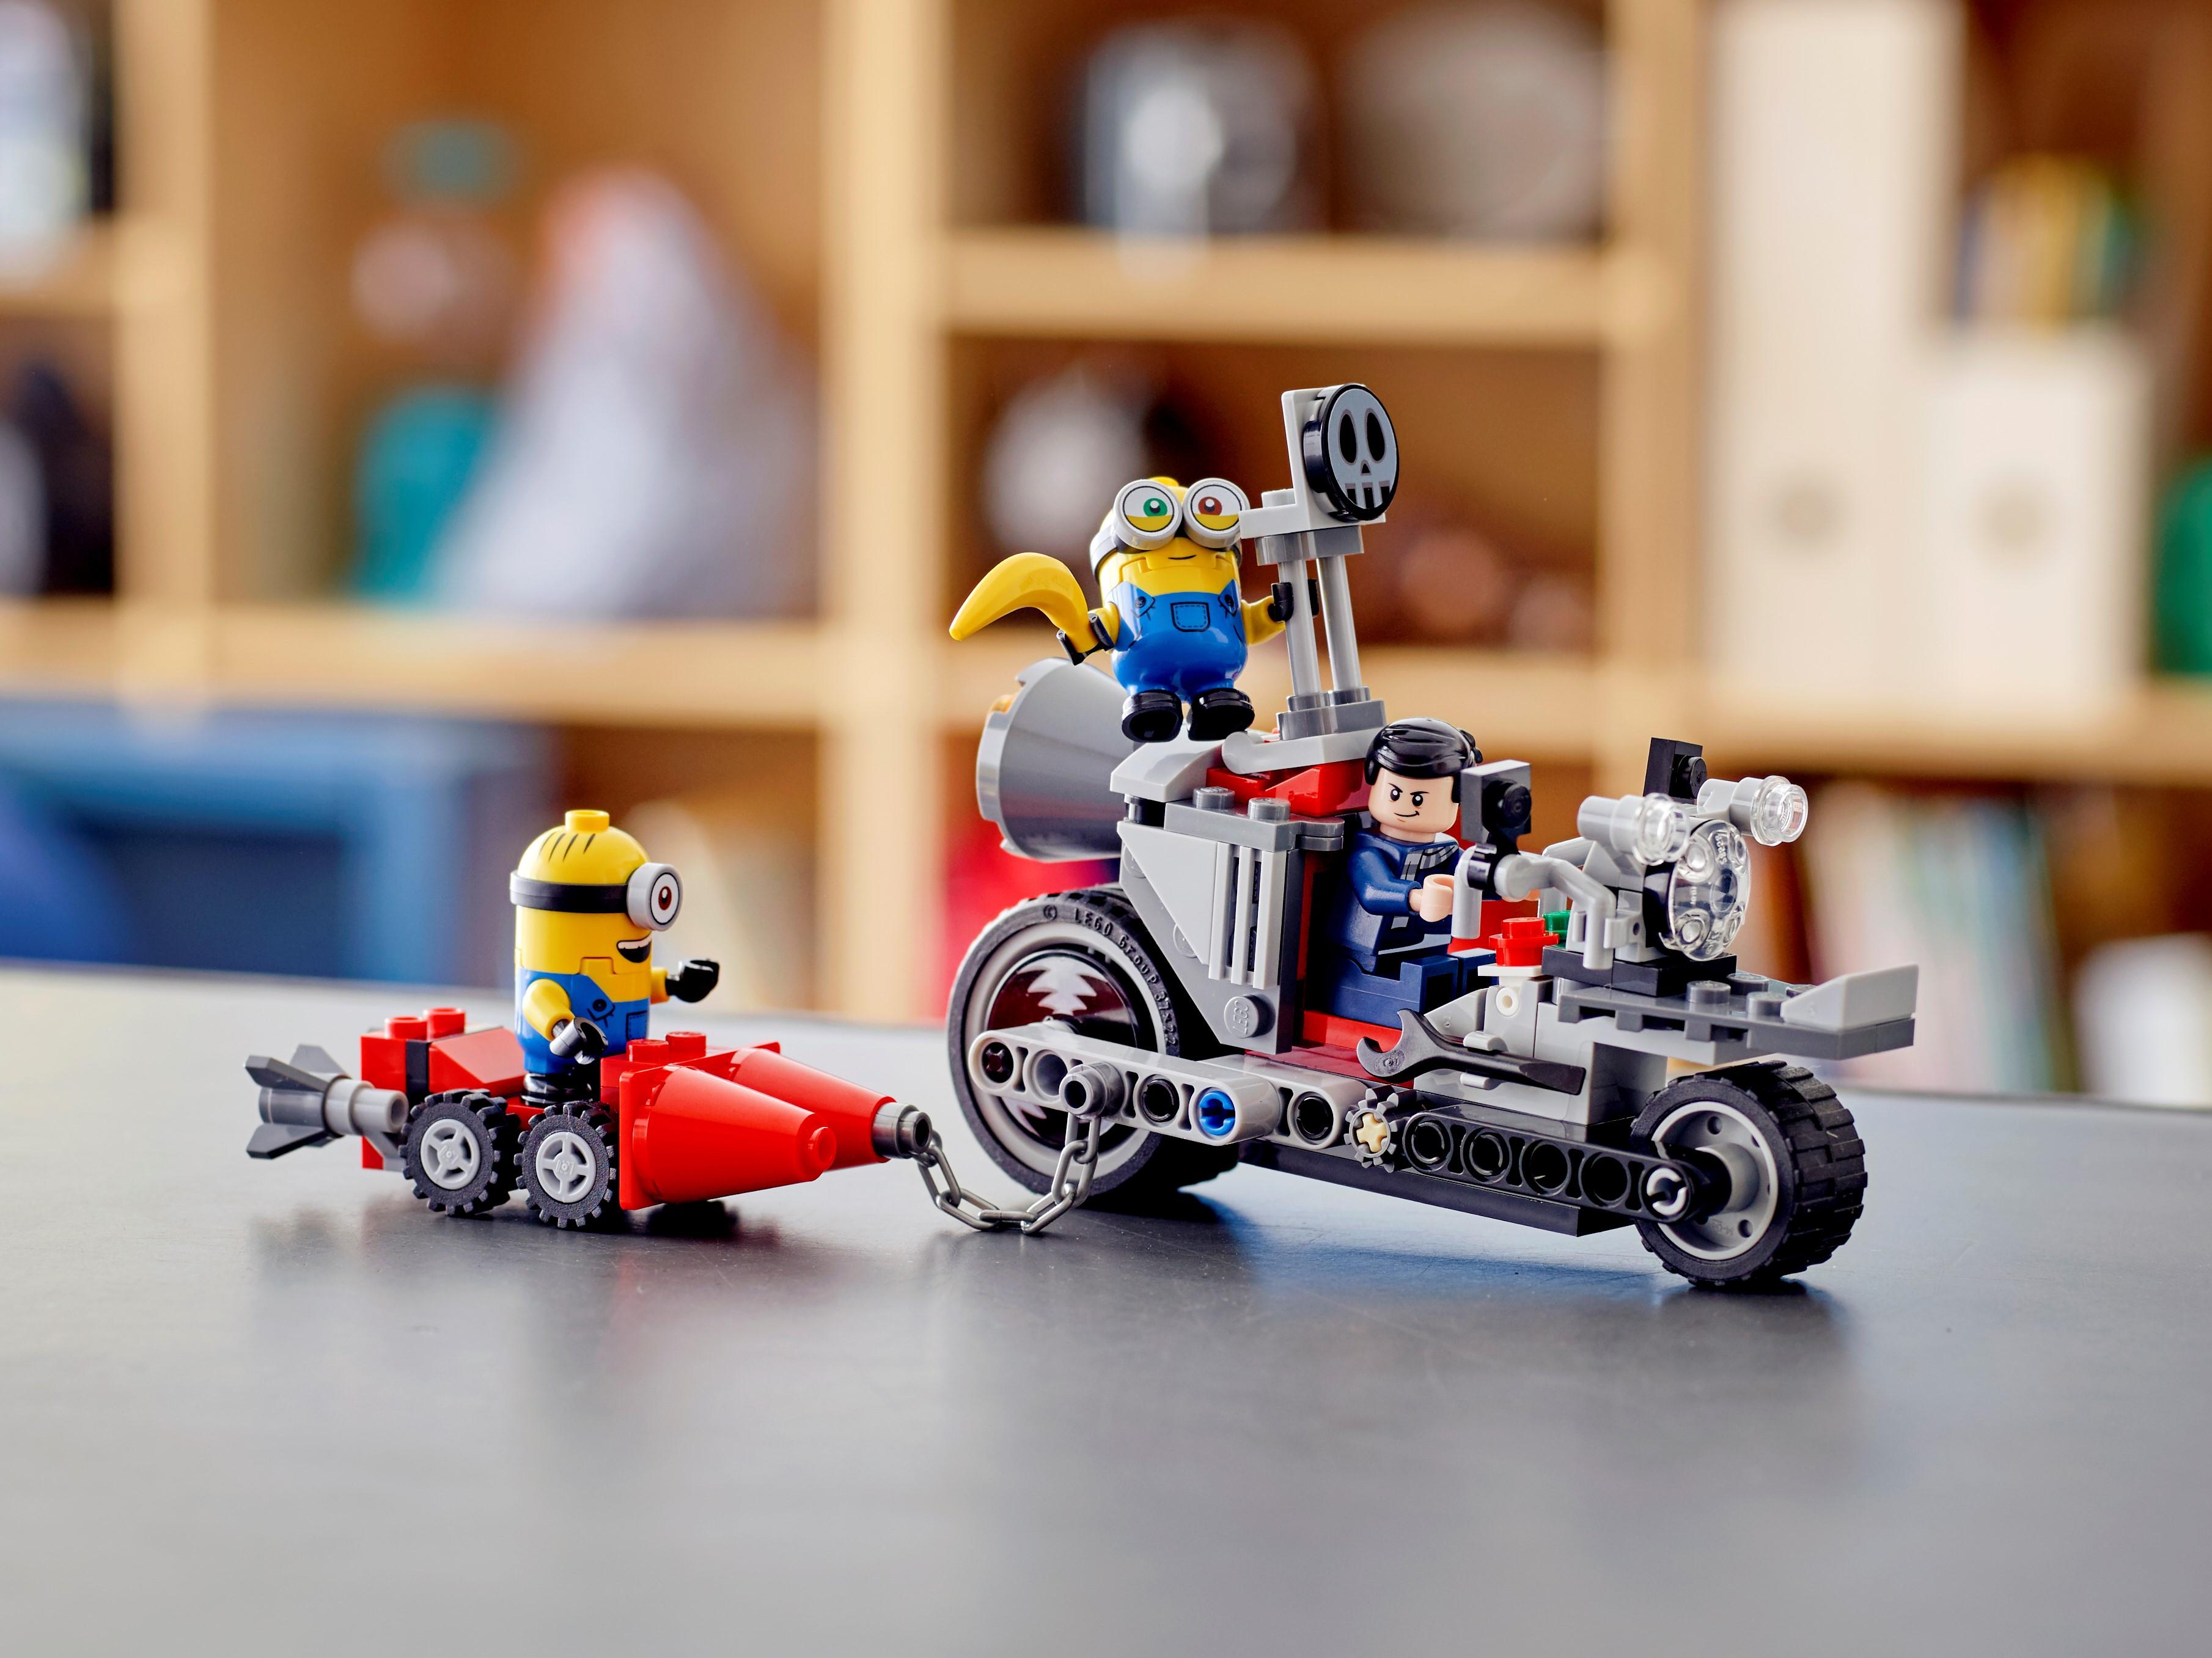 Durdurulamaz Motosiklet Takibi 75549 | Minions | LEGO.com TR